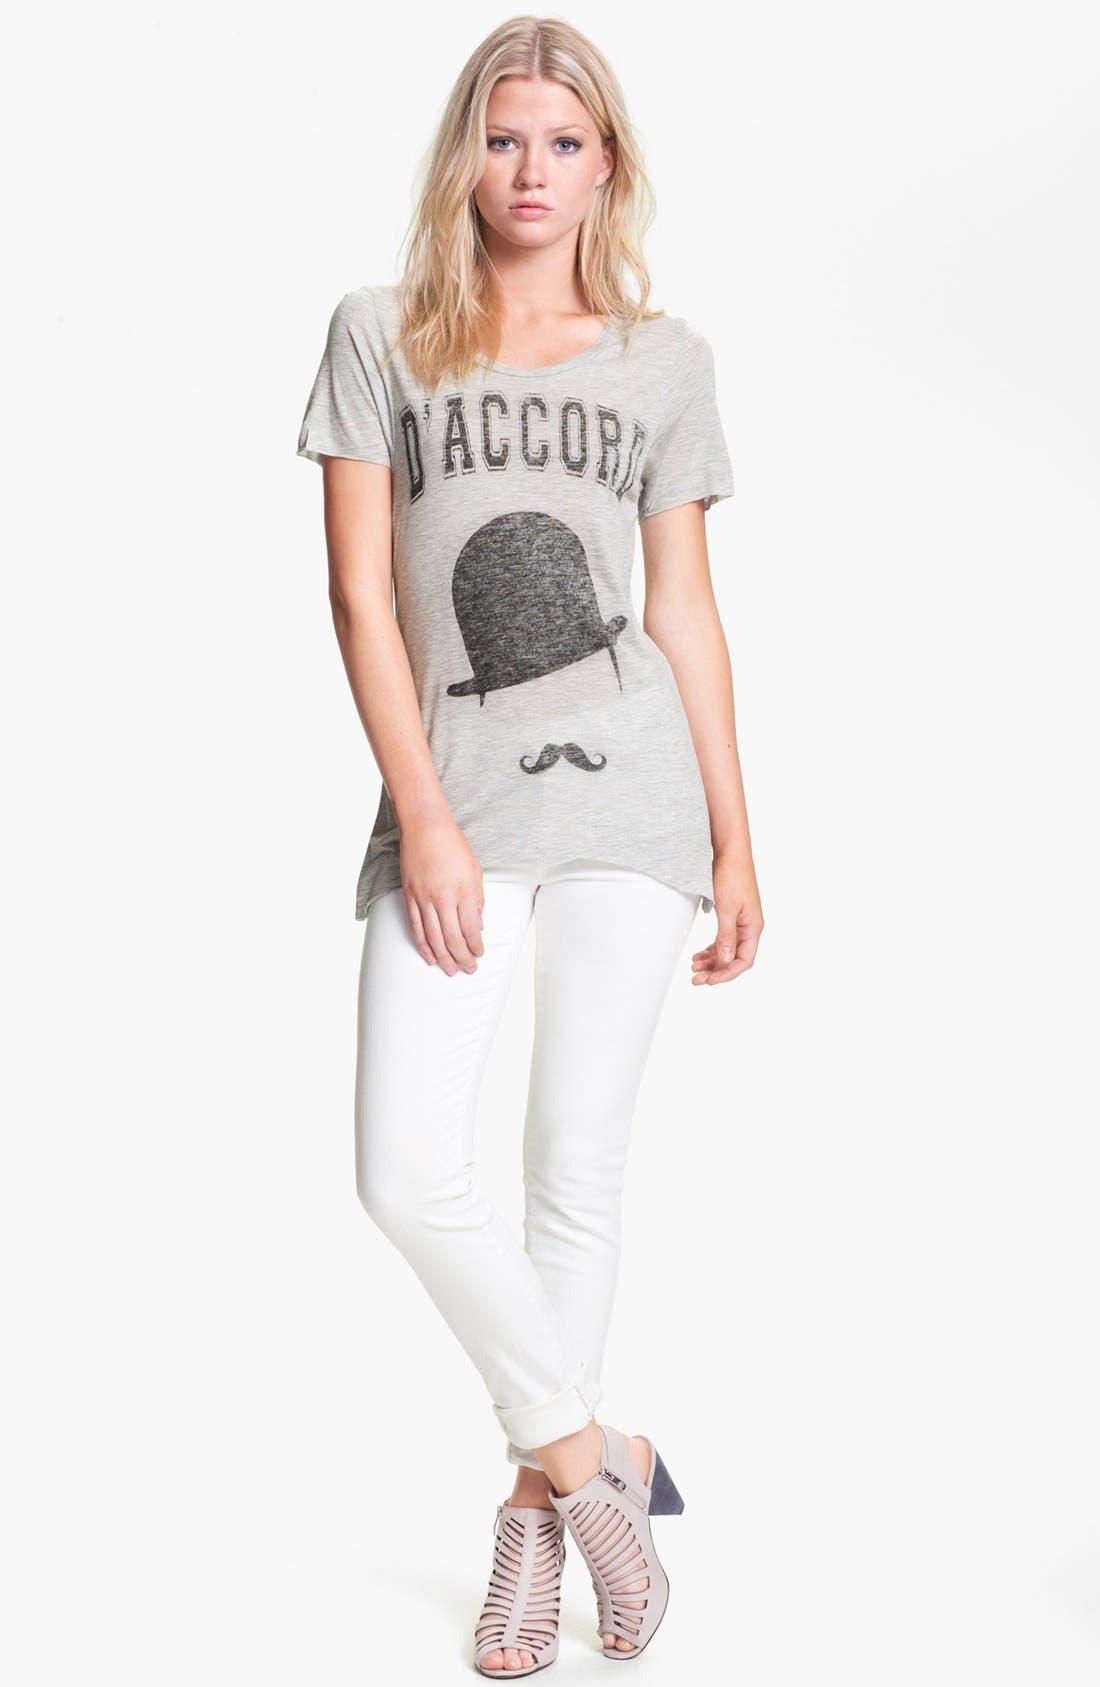 Alternate Image 1 Selected - Zoe Karssen Tee & J Brand Jeans